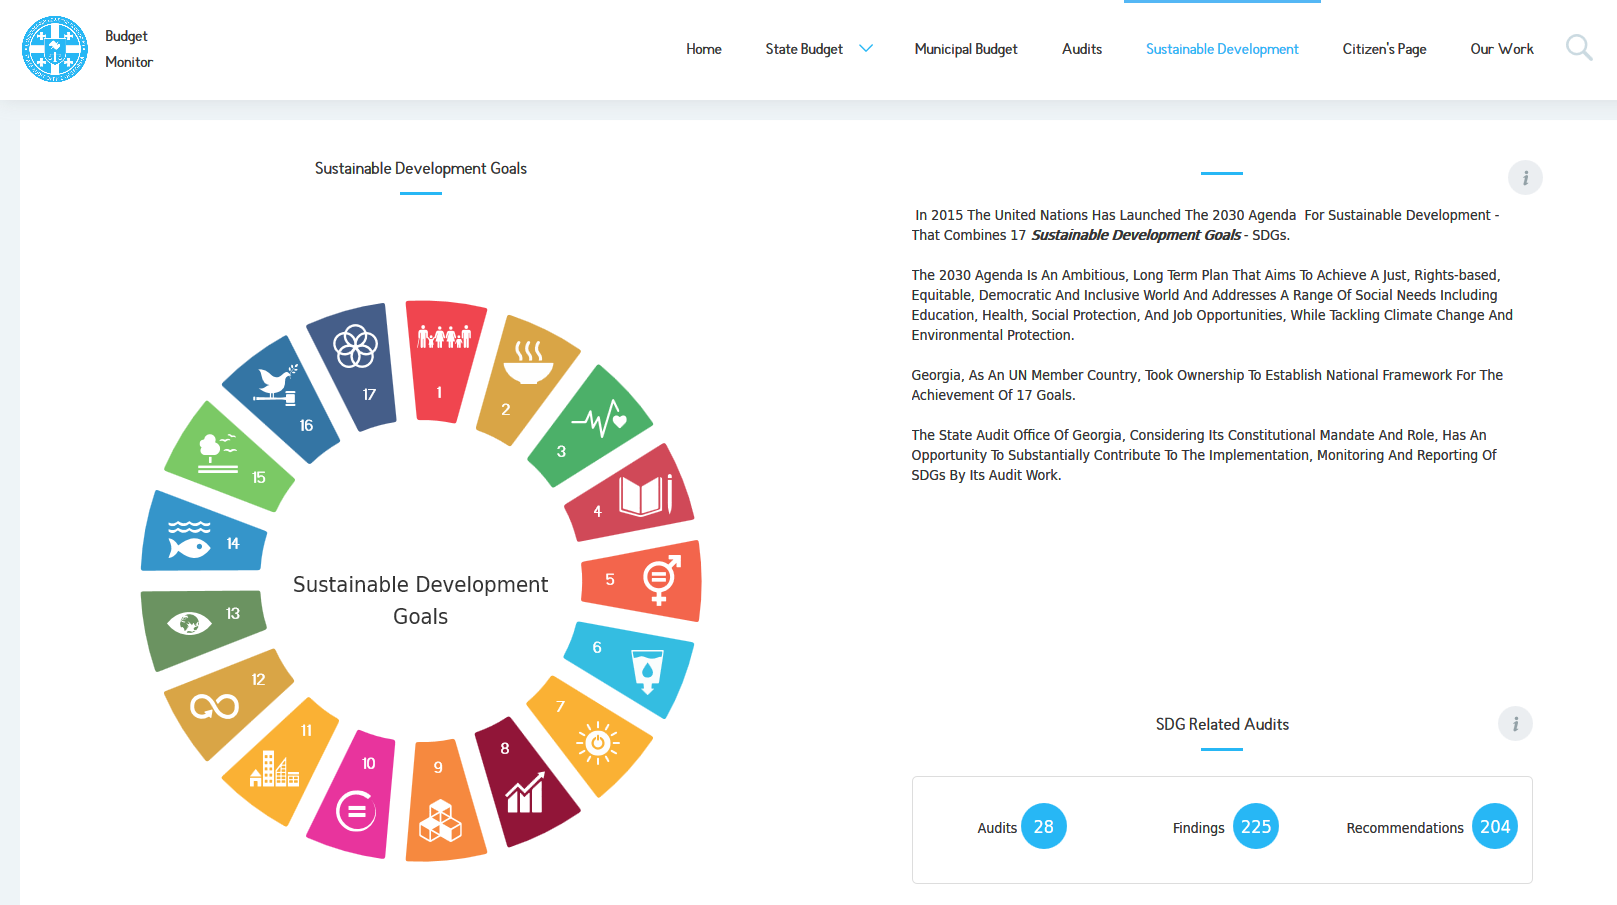 Budget Monitor - SDG